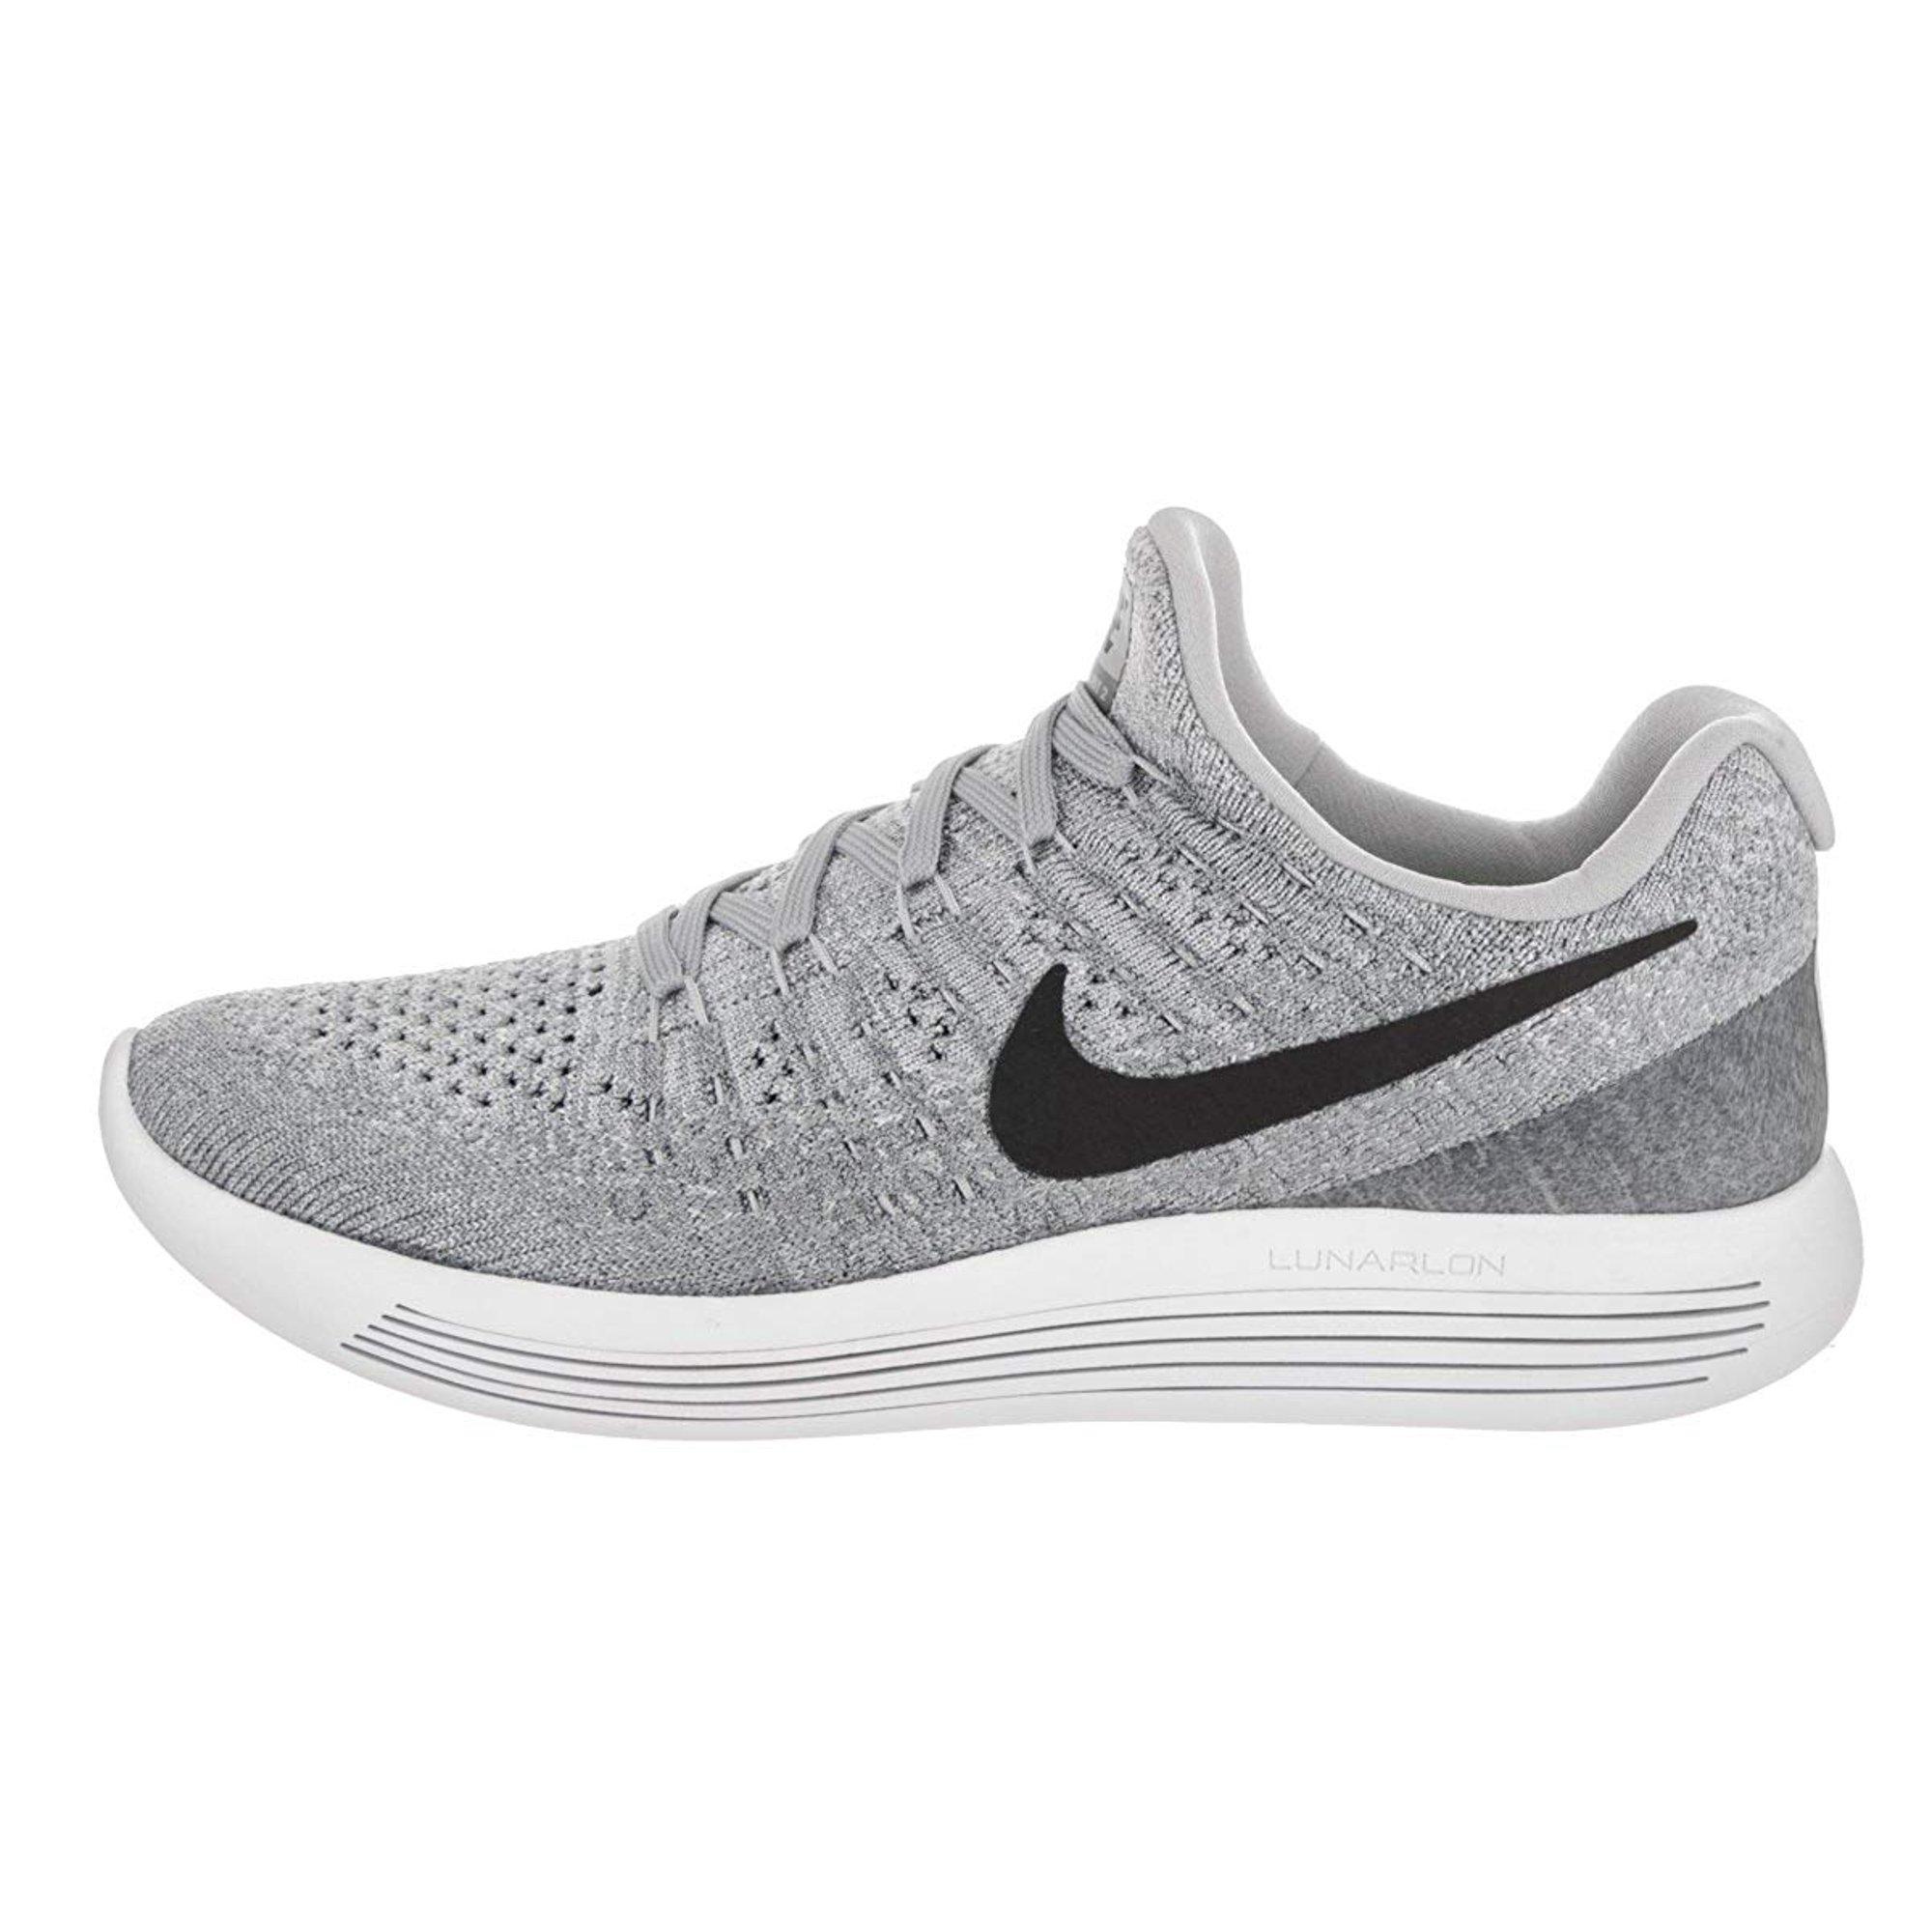 21eb09d61b8c1 Nike Women s Lunarepic Low Flyknit 2 Running Shoe